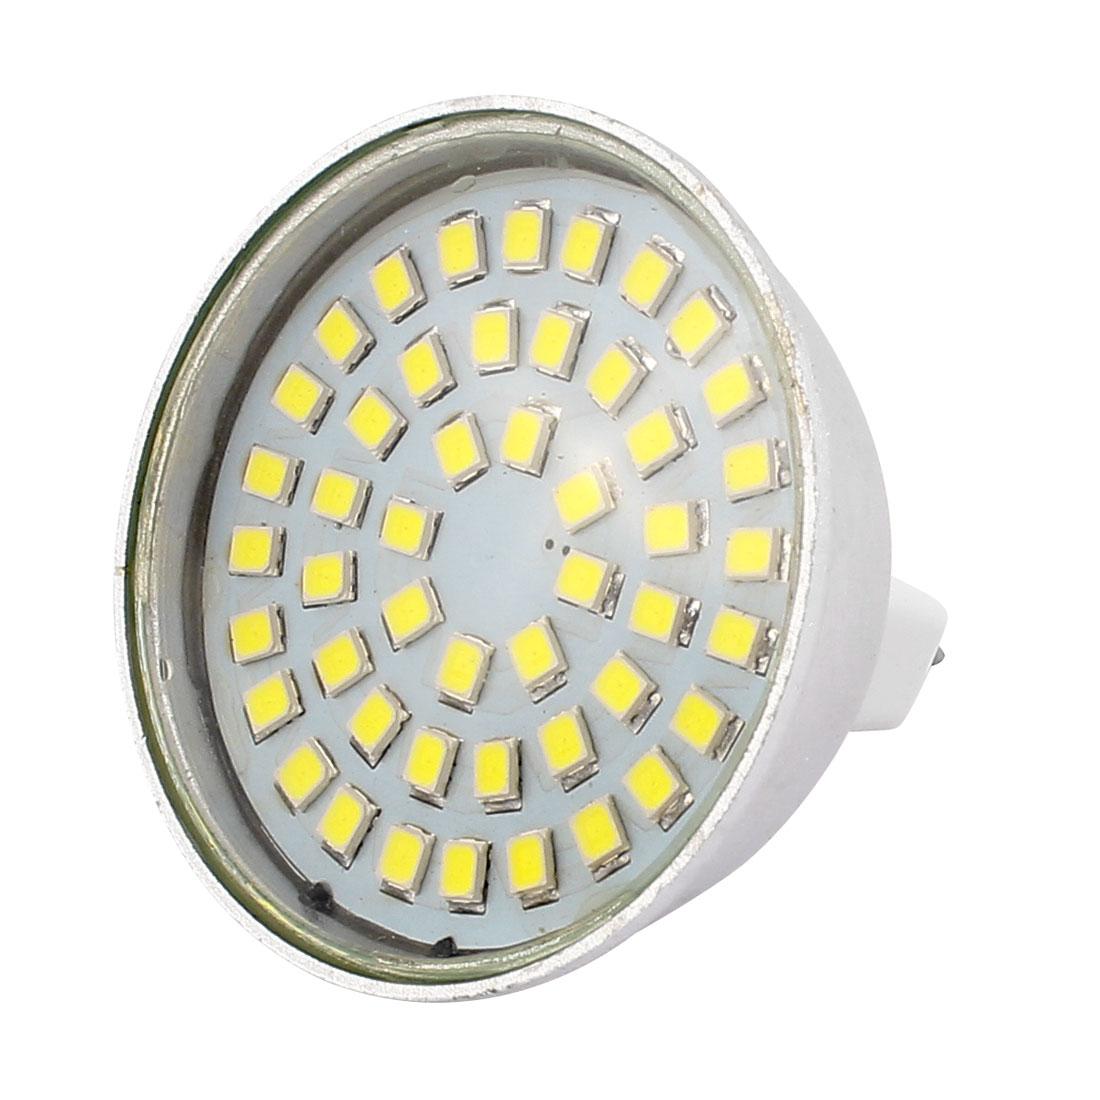 MR16 SMD 2835 48 LEDs 4W Aluminum Energy-Saving LED Lamp Bulb White AC 220V-240V